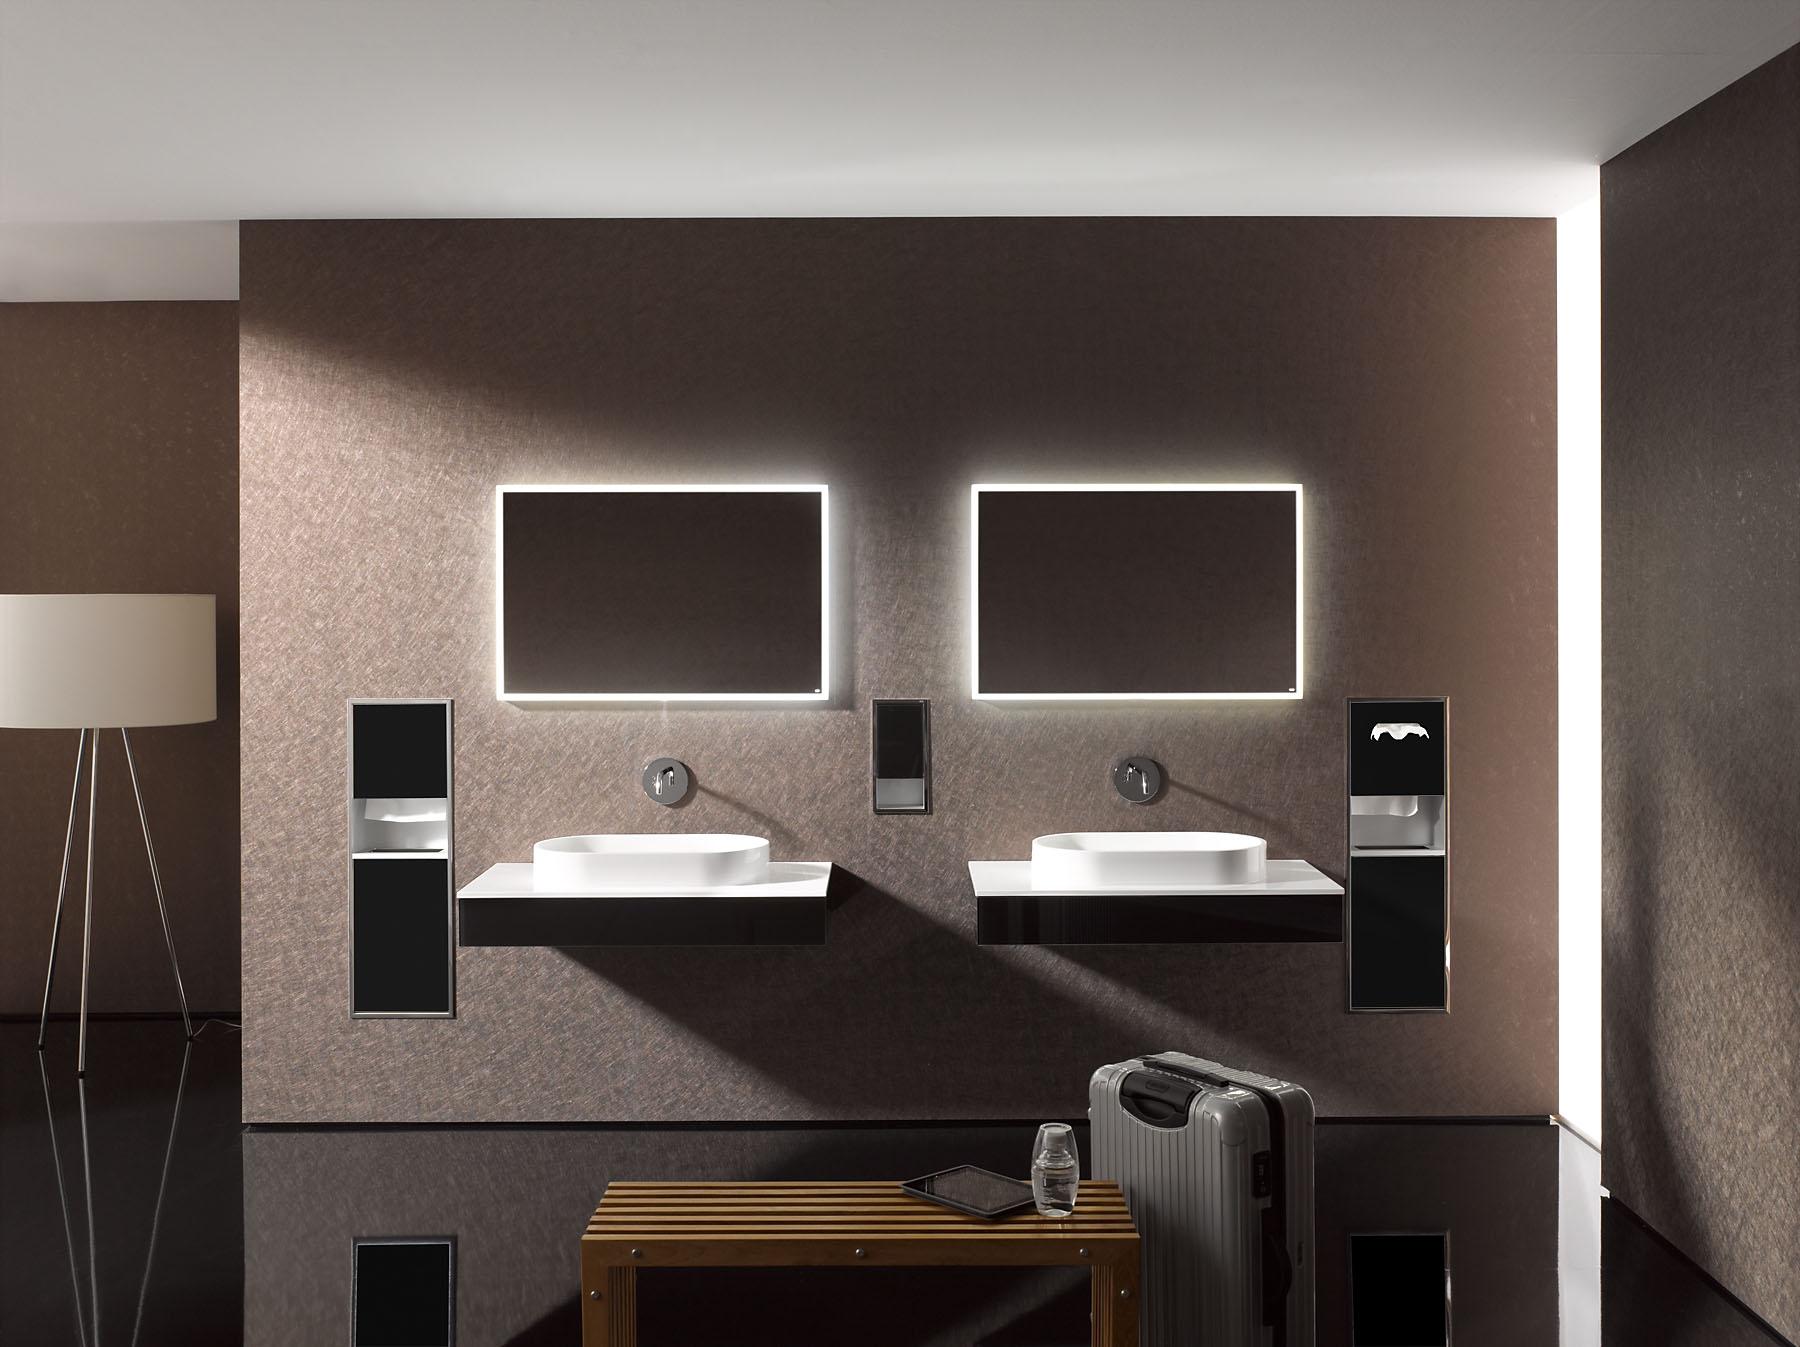 Badkamer spiegelkast met led verlichting: sgs cm size badkamer ...